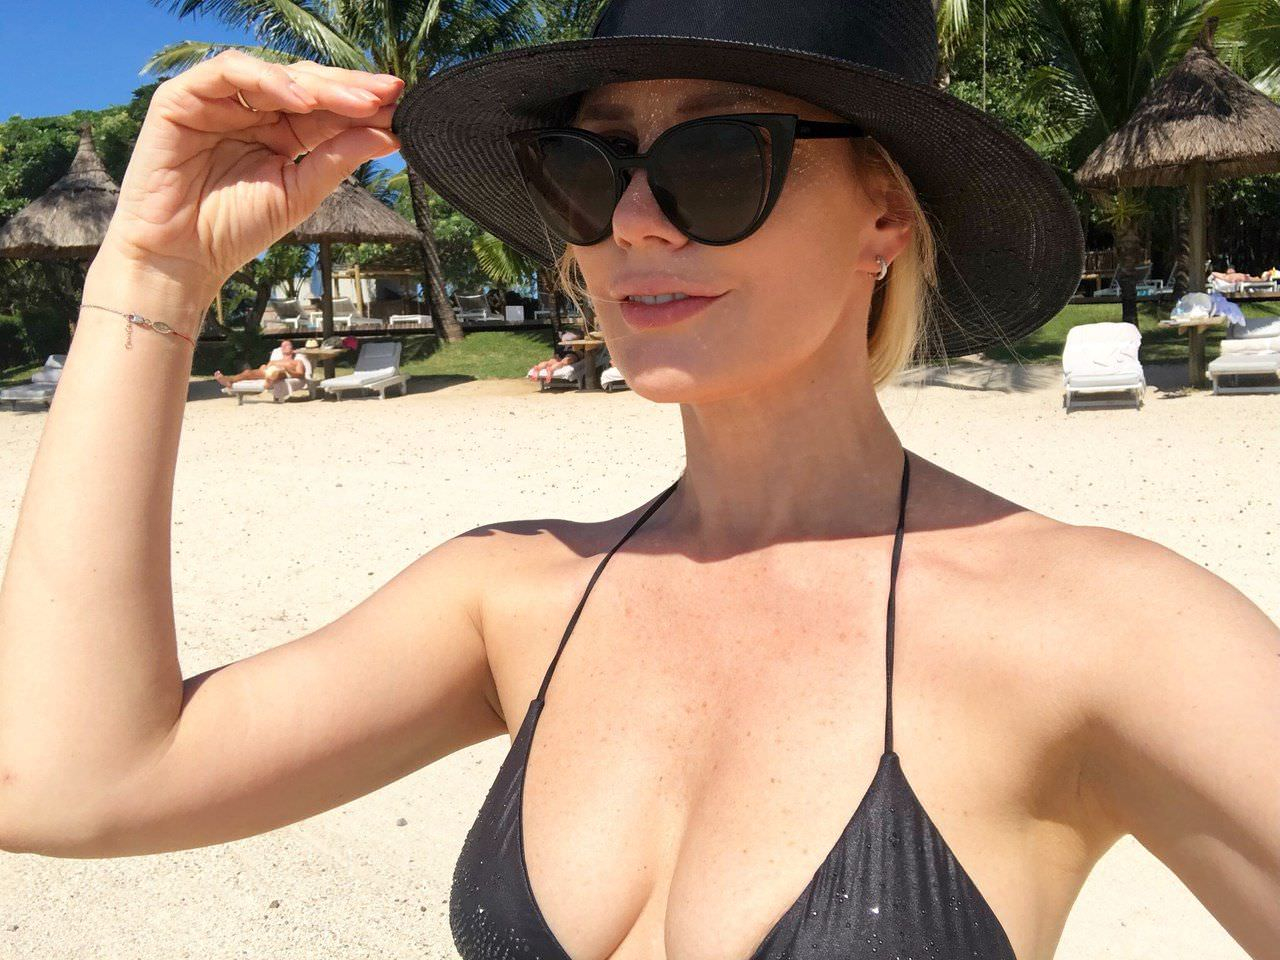 Елена Летучая фото на пляже